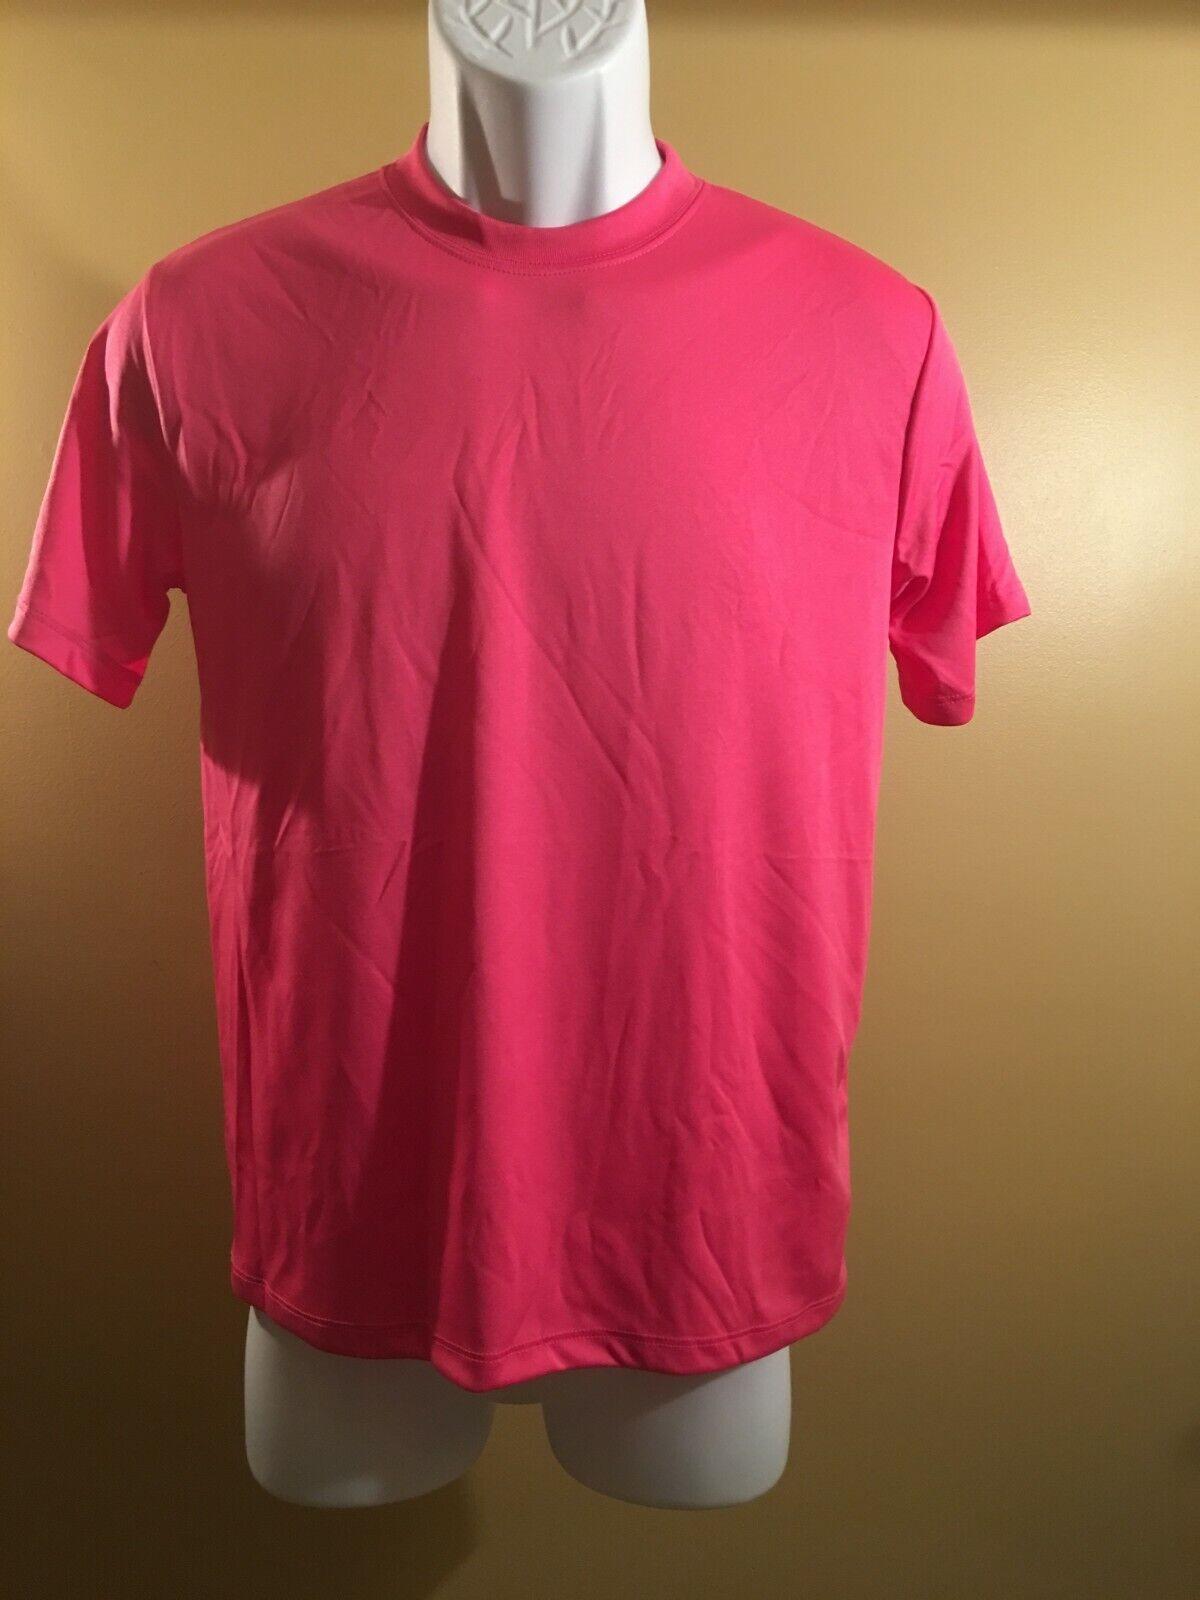 760bfaf0 Hanes Boys Cool DRI T-Shirt Wow Pink Large